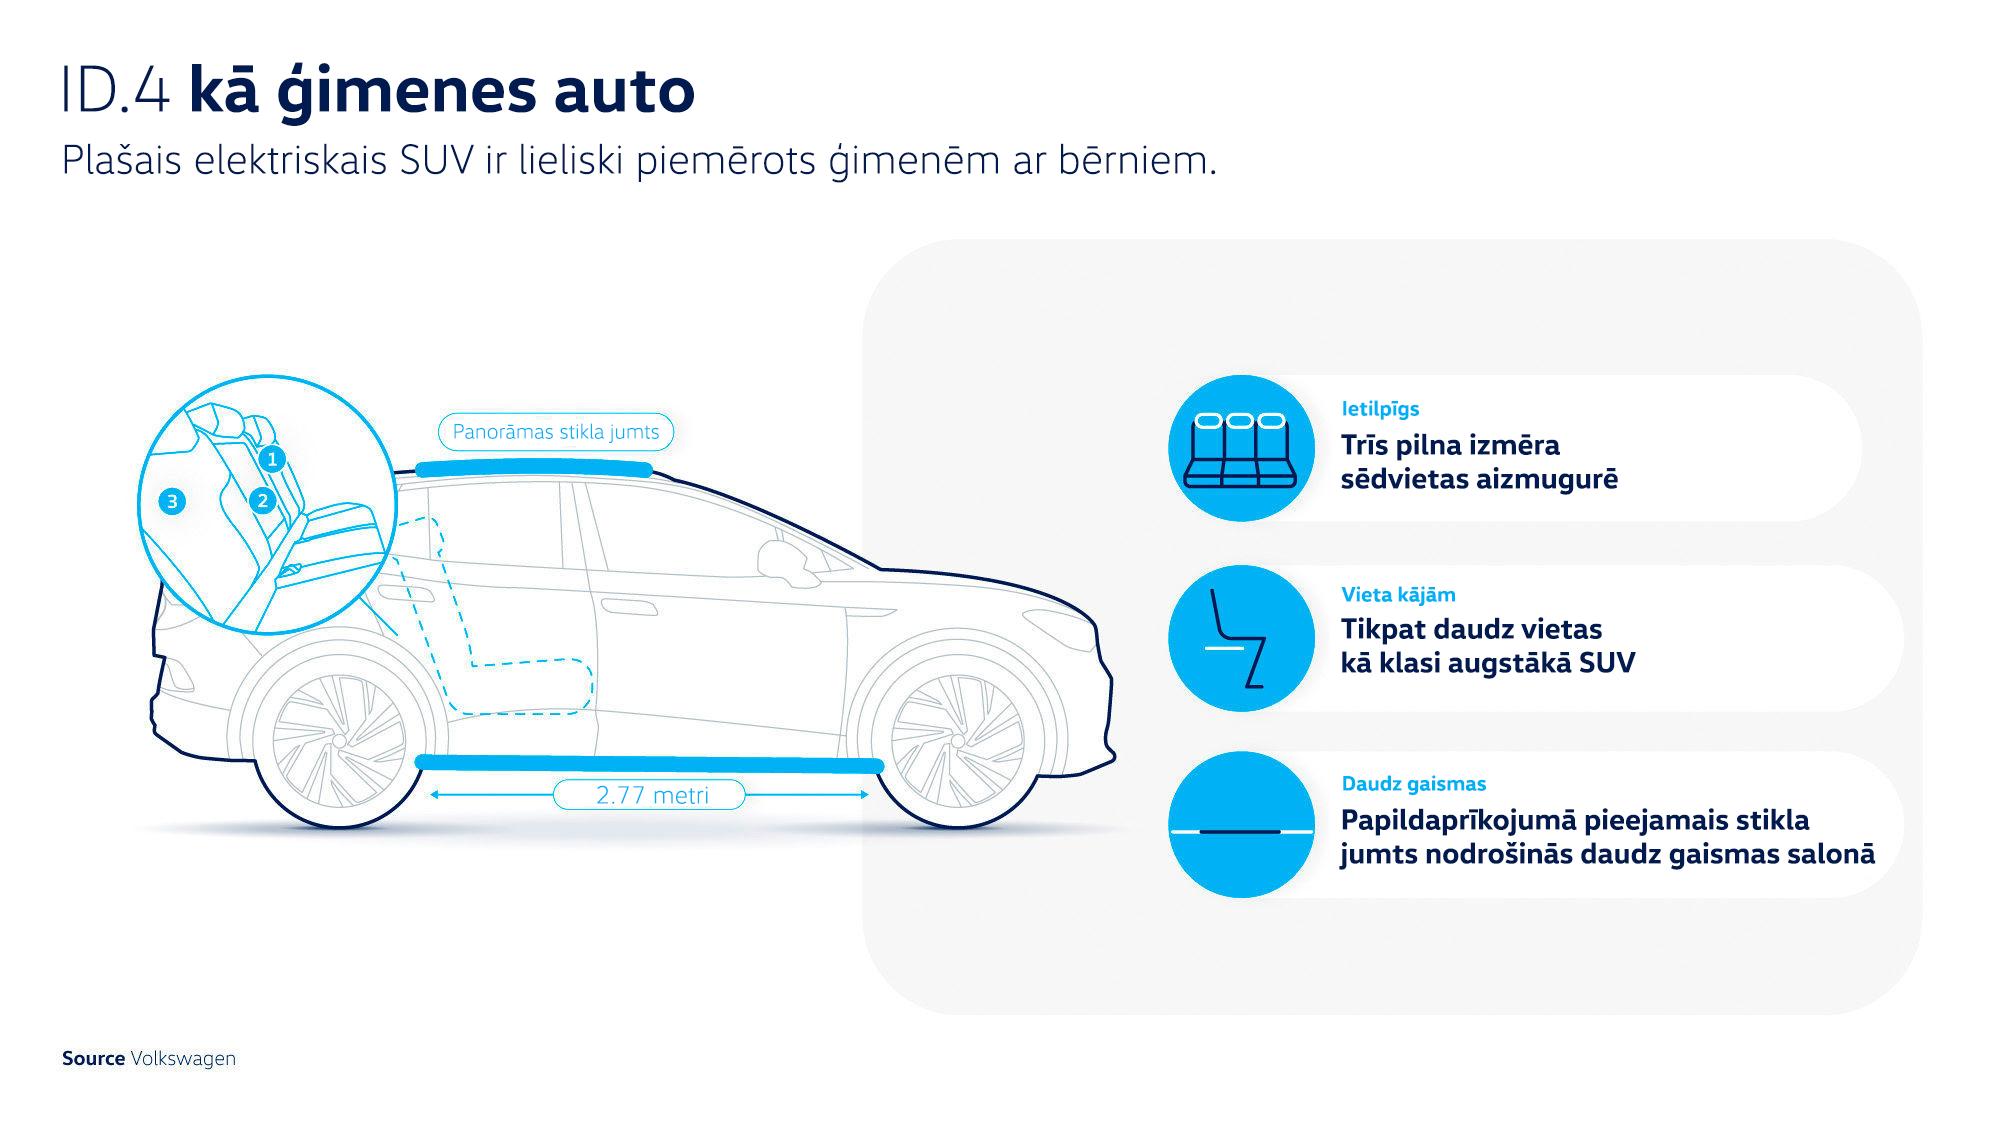 volkswagen-elektroauto-id4-gimenes-auto